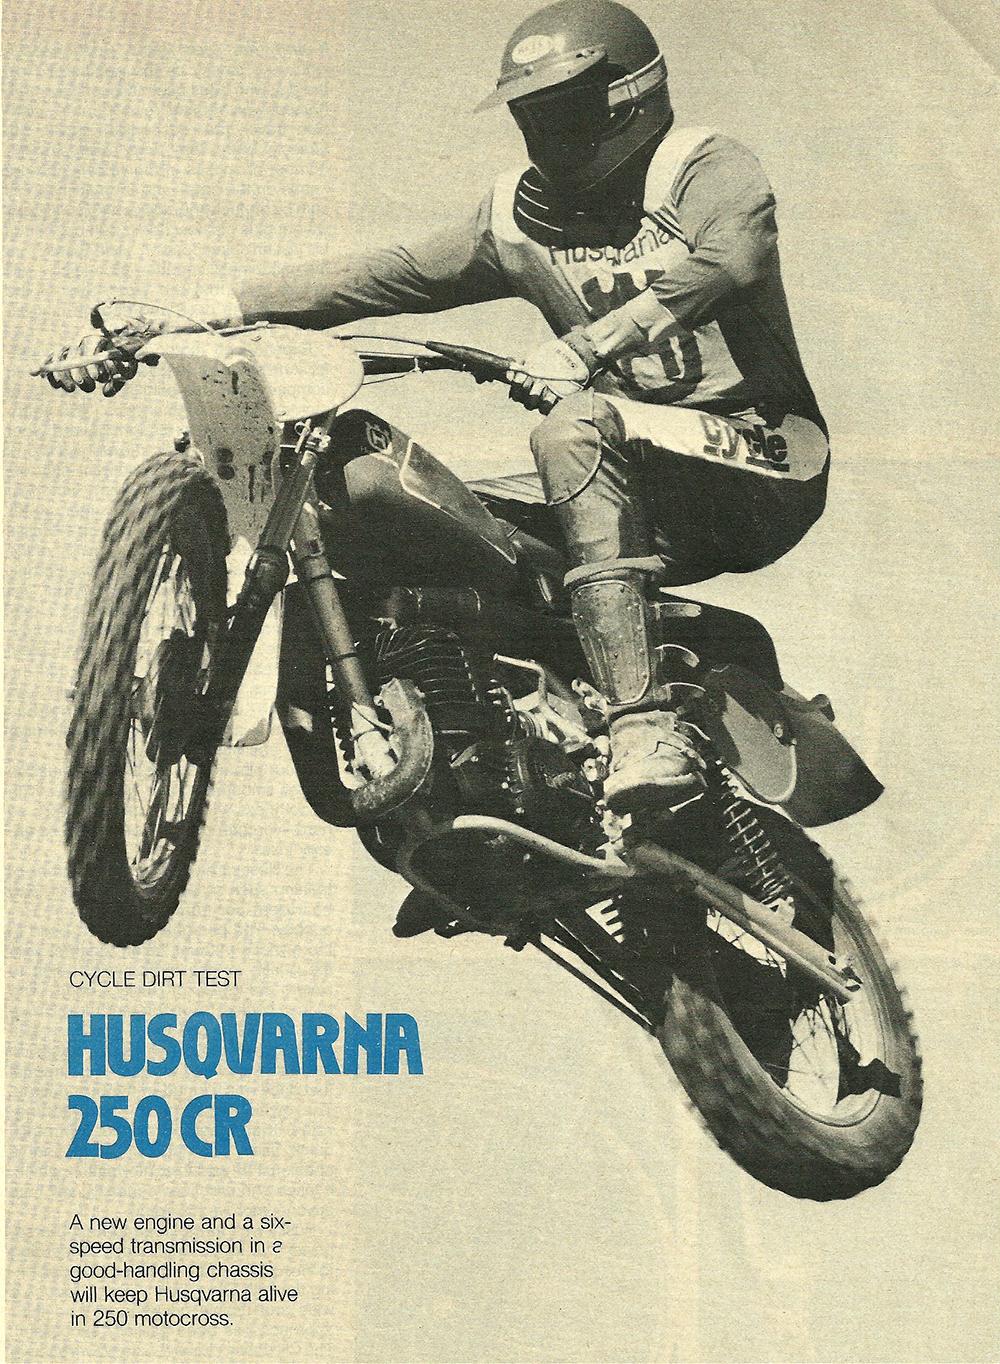 1978 Husqvarna 250 CR road test 1.jpg